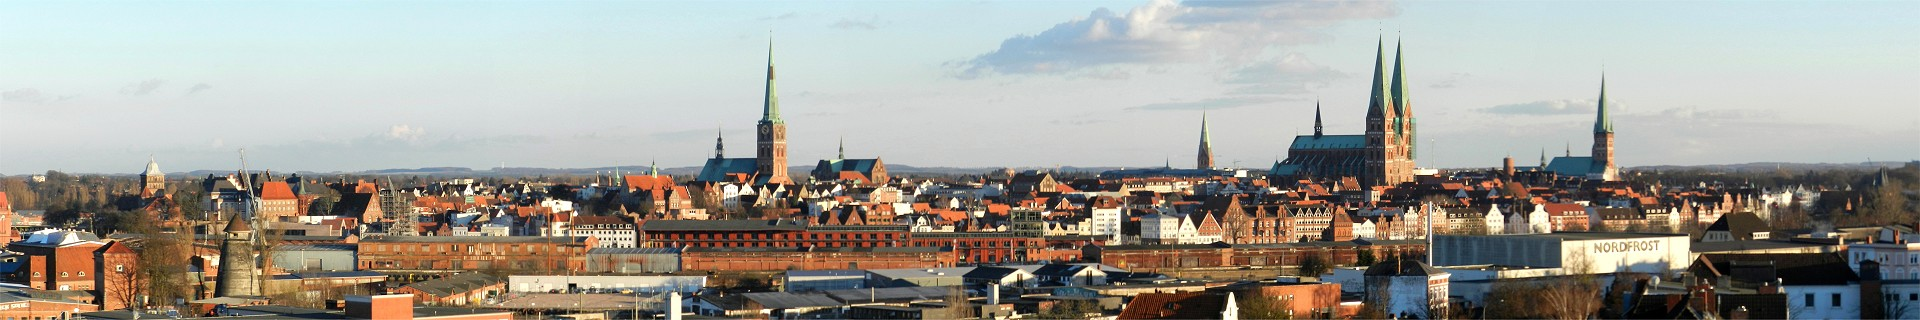 2016 Lübeck 41 Udsigt panorama